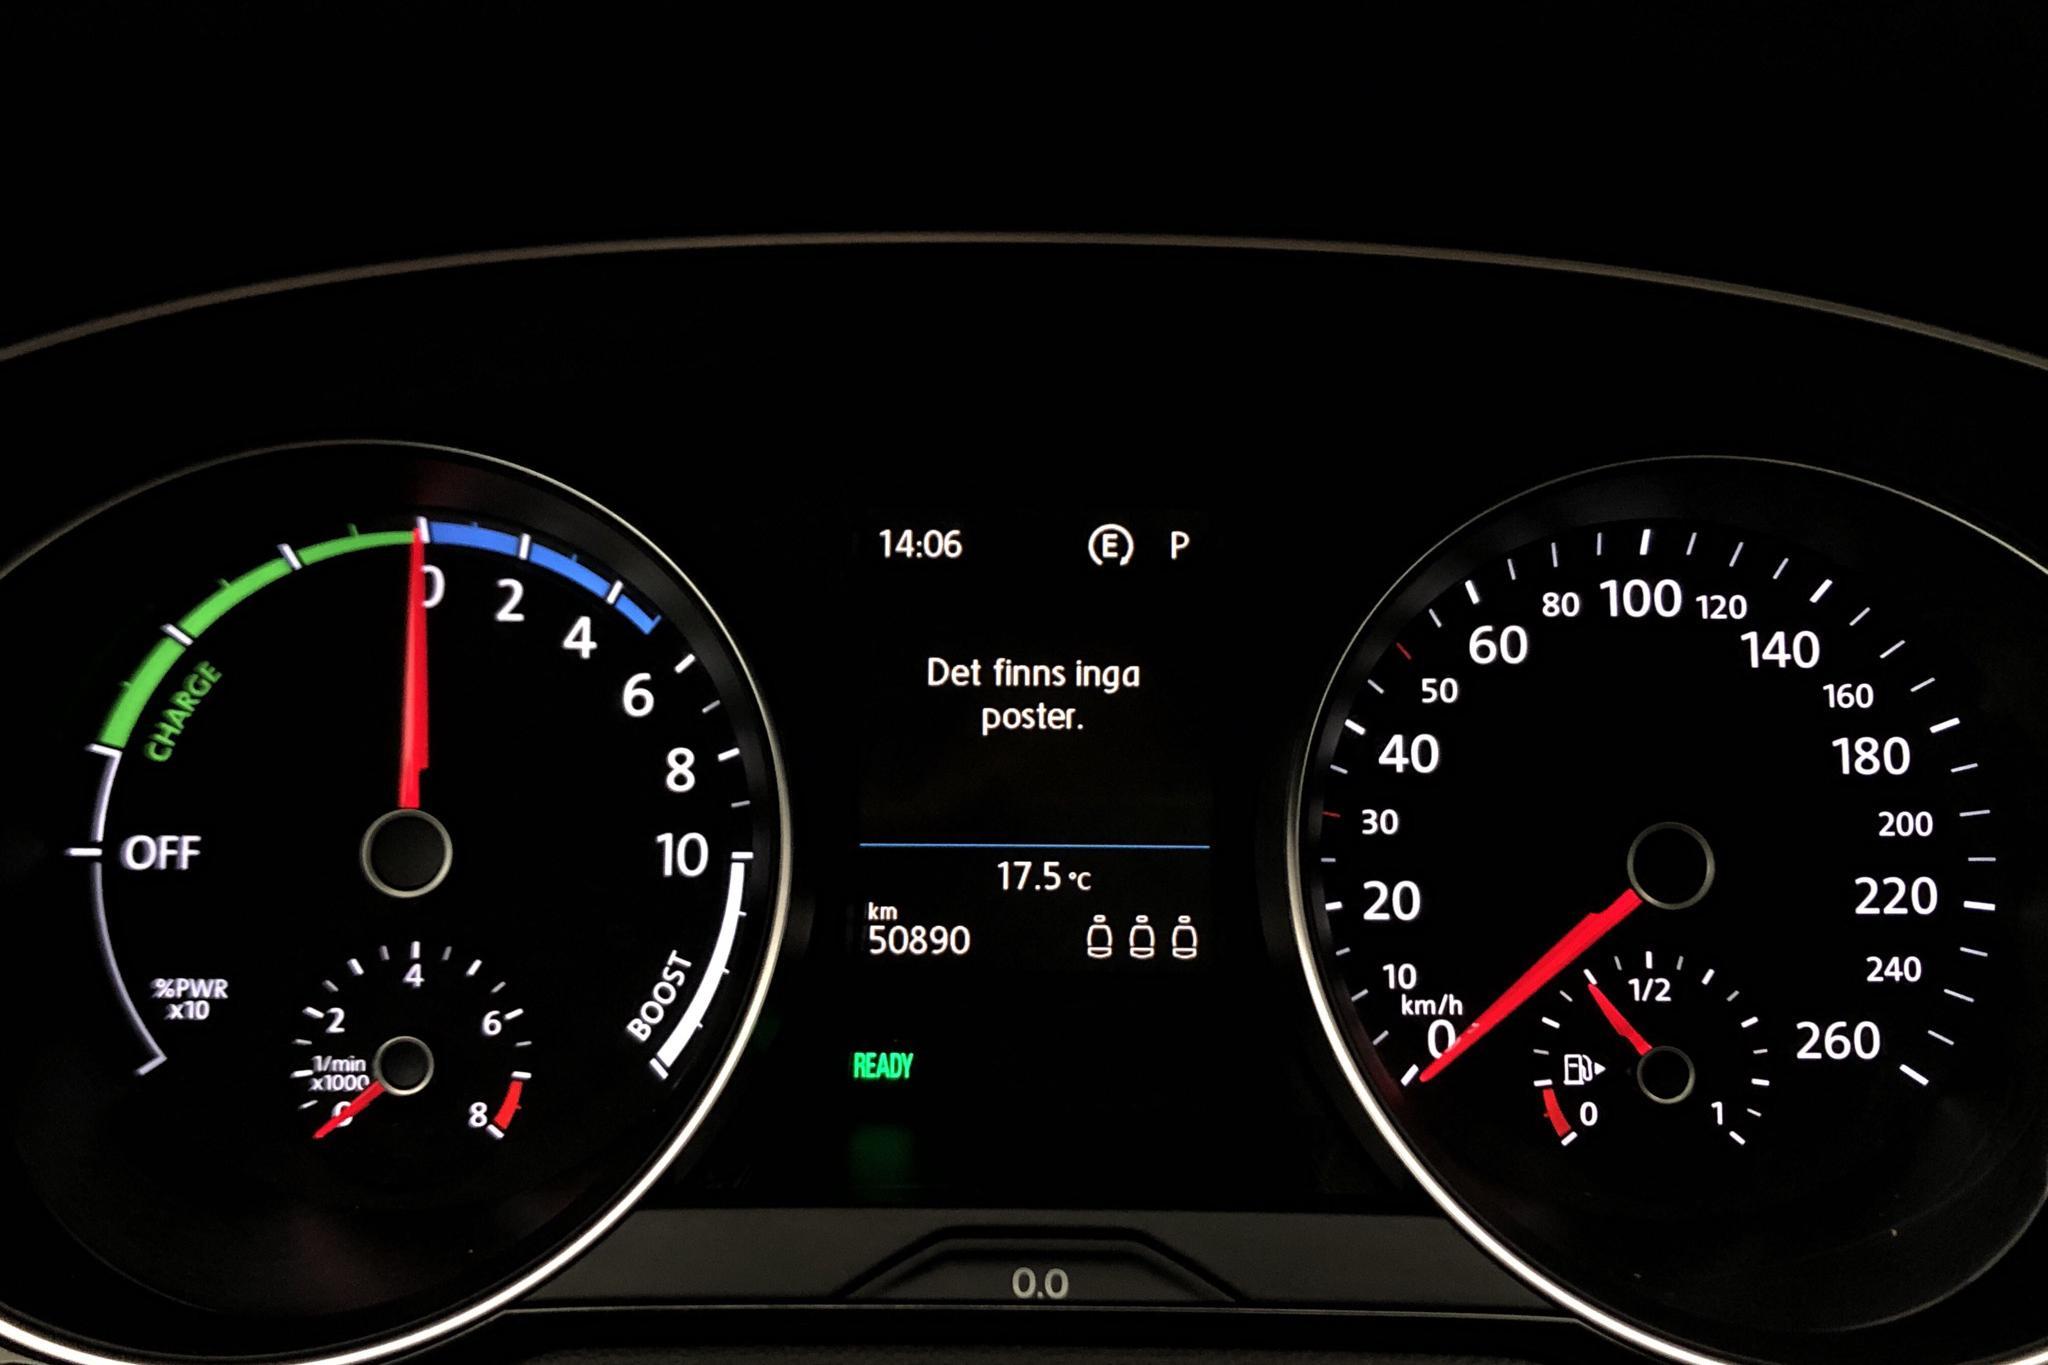 VW Passat 1.4 Plug-in-Hybrid Sportscombi (218hk) - 50 890 km - Automatic - Dark Grey - 2017